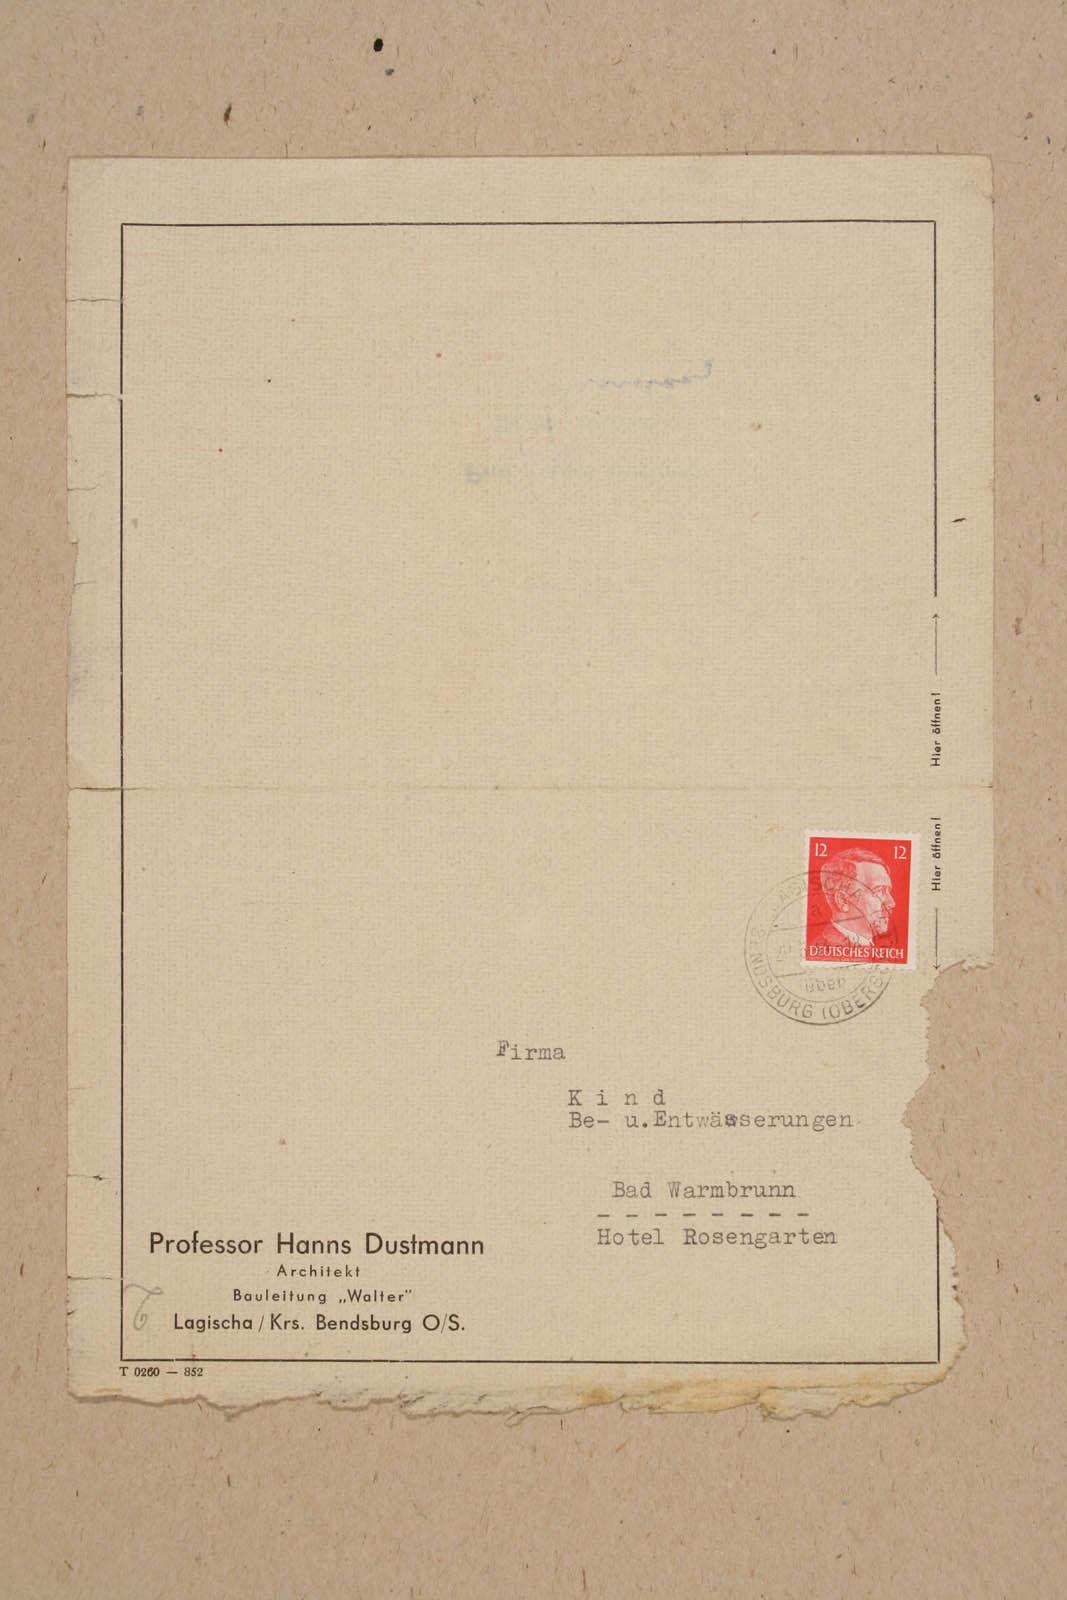 Archiwum Panstwowe w Katowicach Land 879 70 1 02